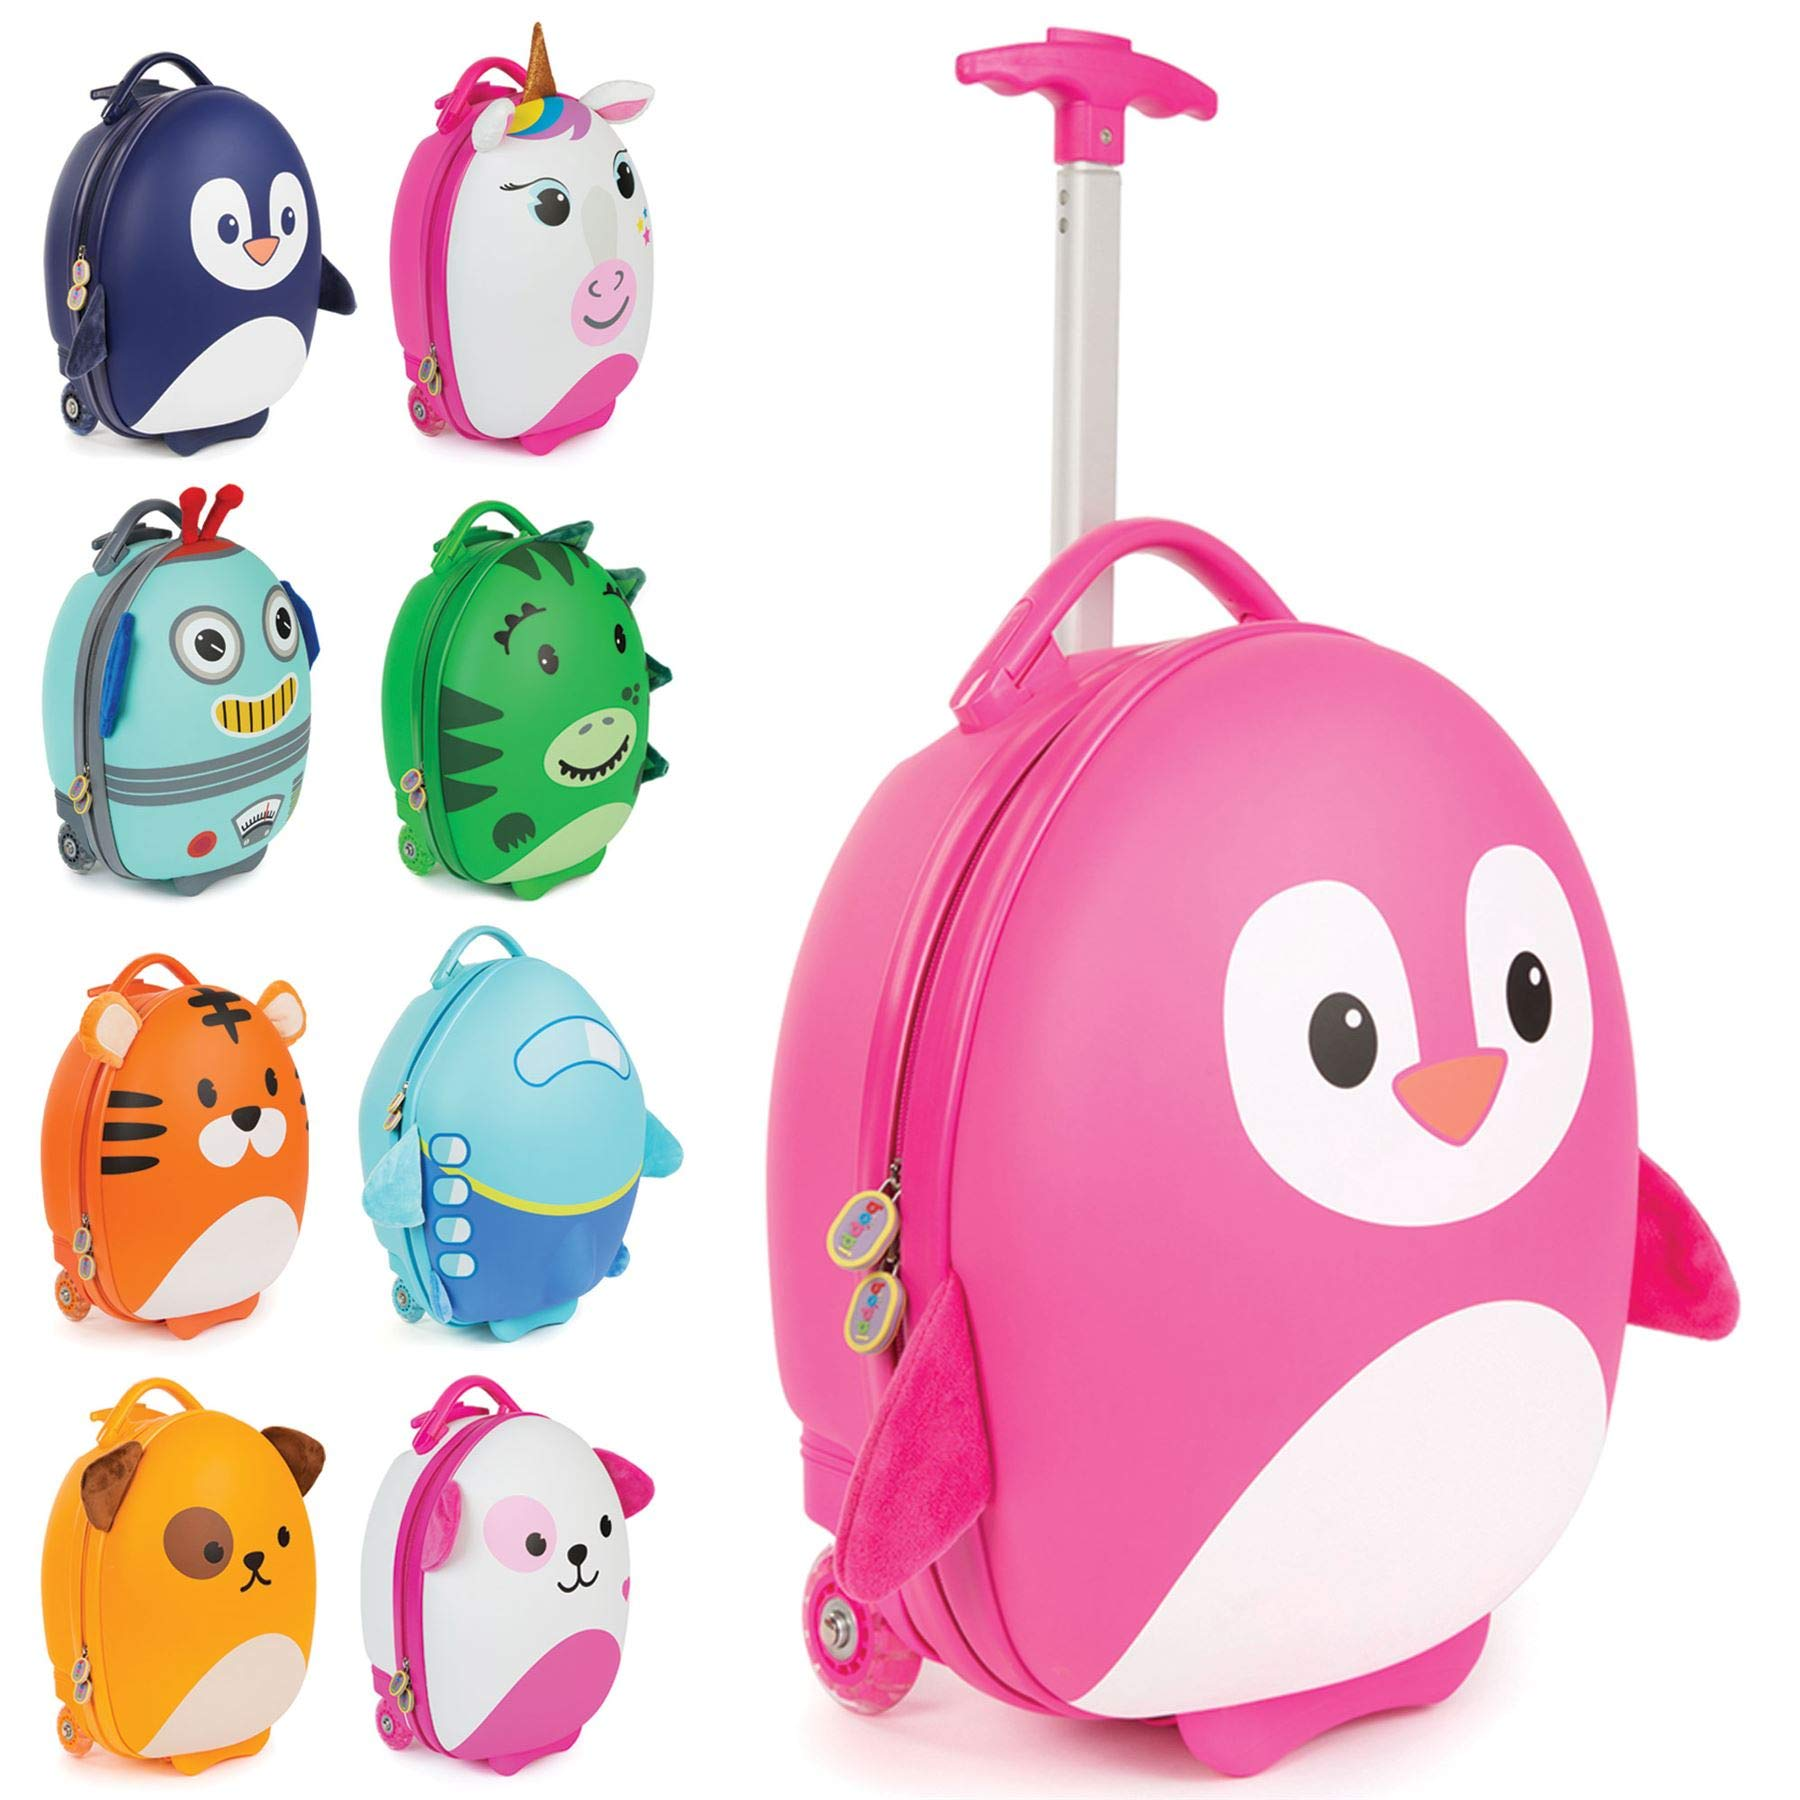 Boppi Tiny Trekker Kids Luggage Travel Suitcase Carry On Cabin Bag Holiday Pull Along Trolley Lighweight Wheeled Holdall 17 Litre Hand Case - Pink Penguin by boppi